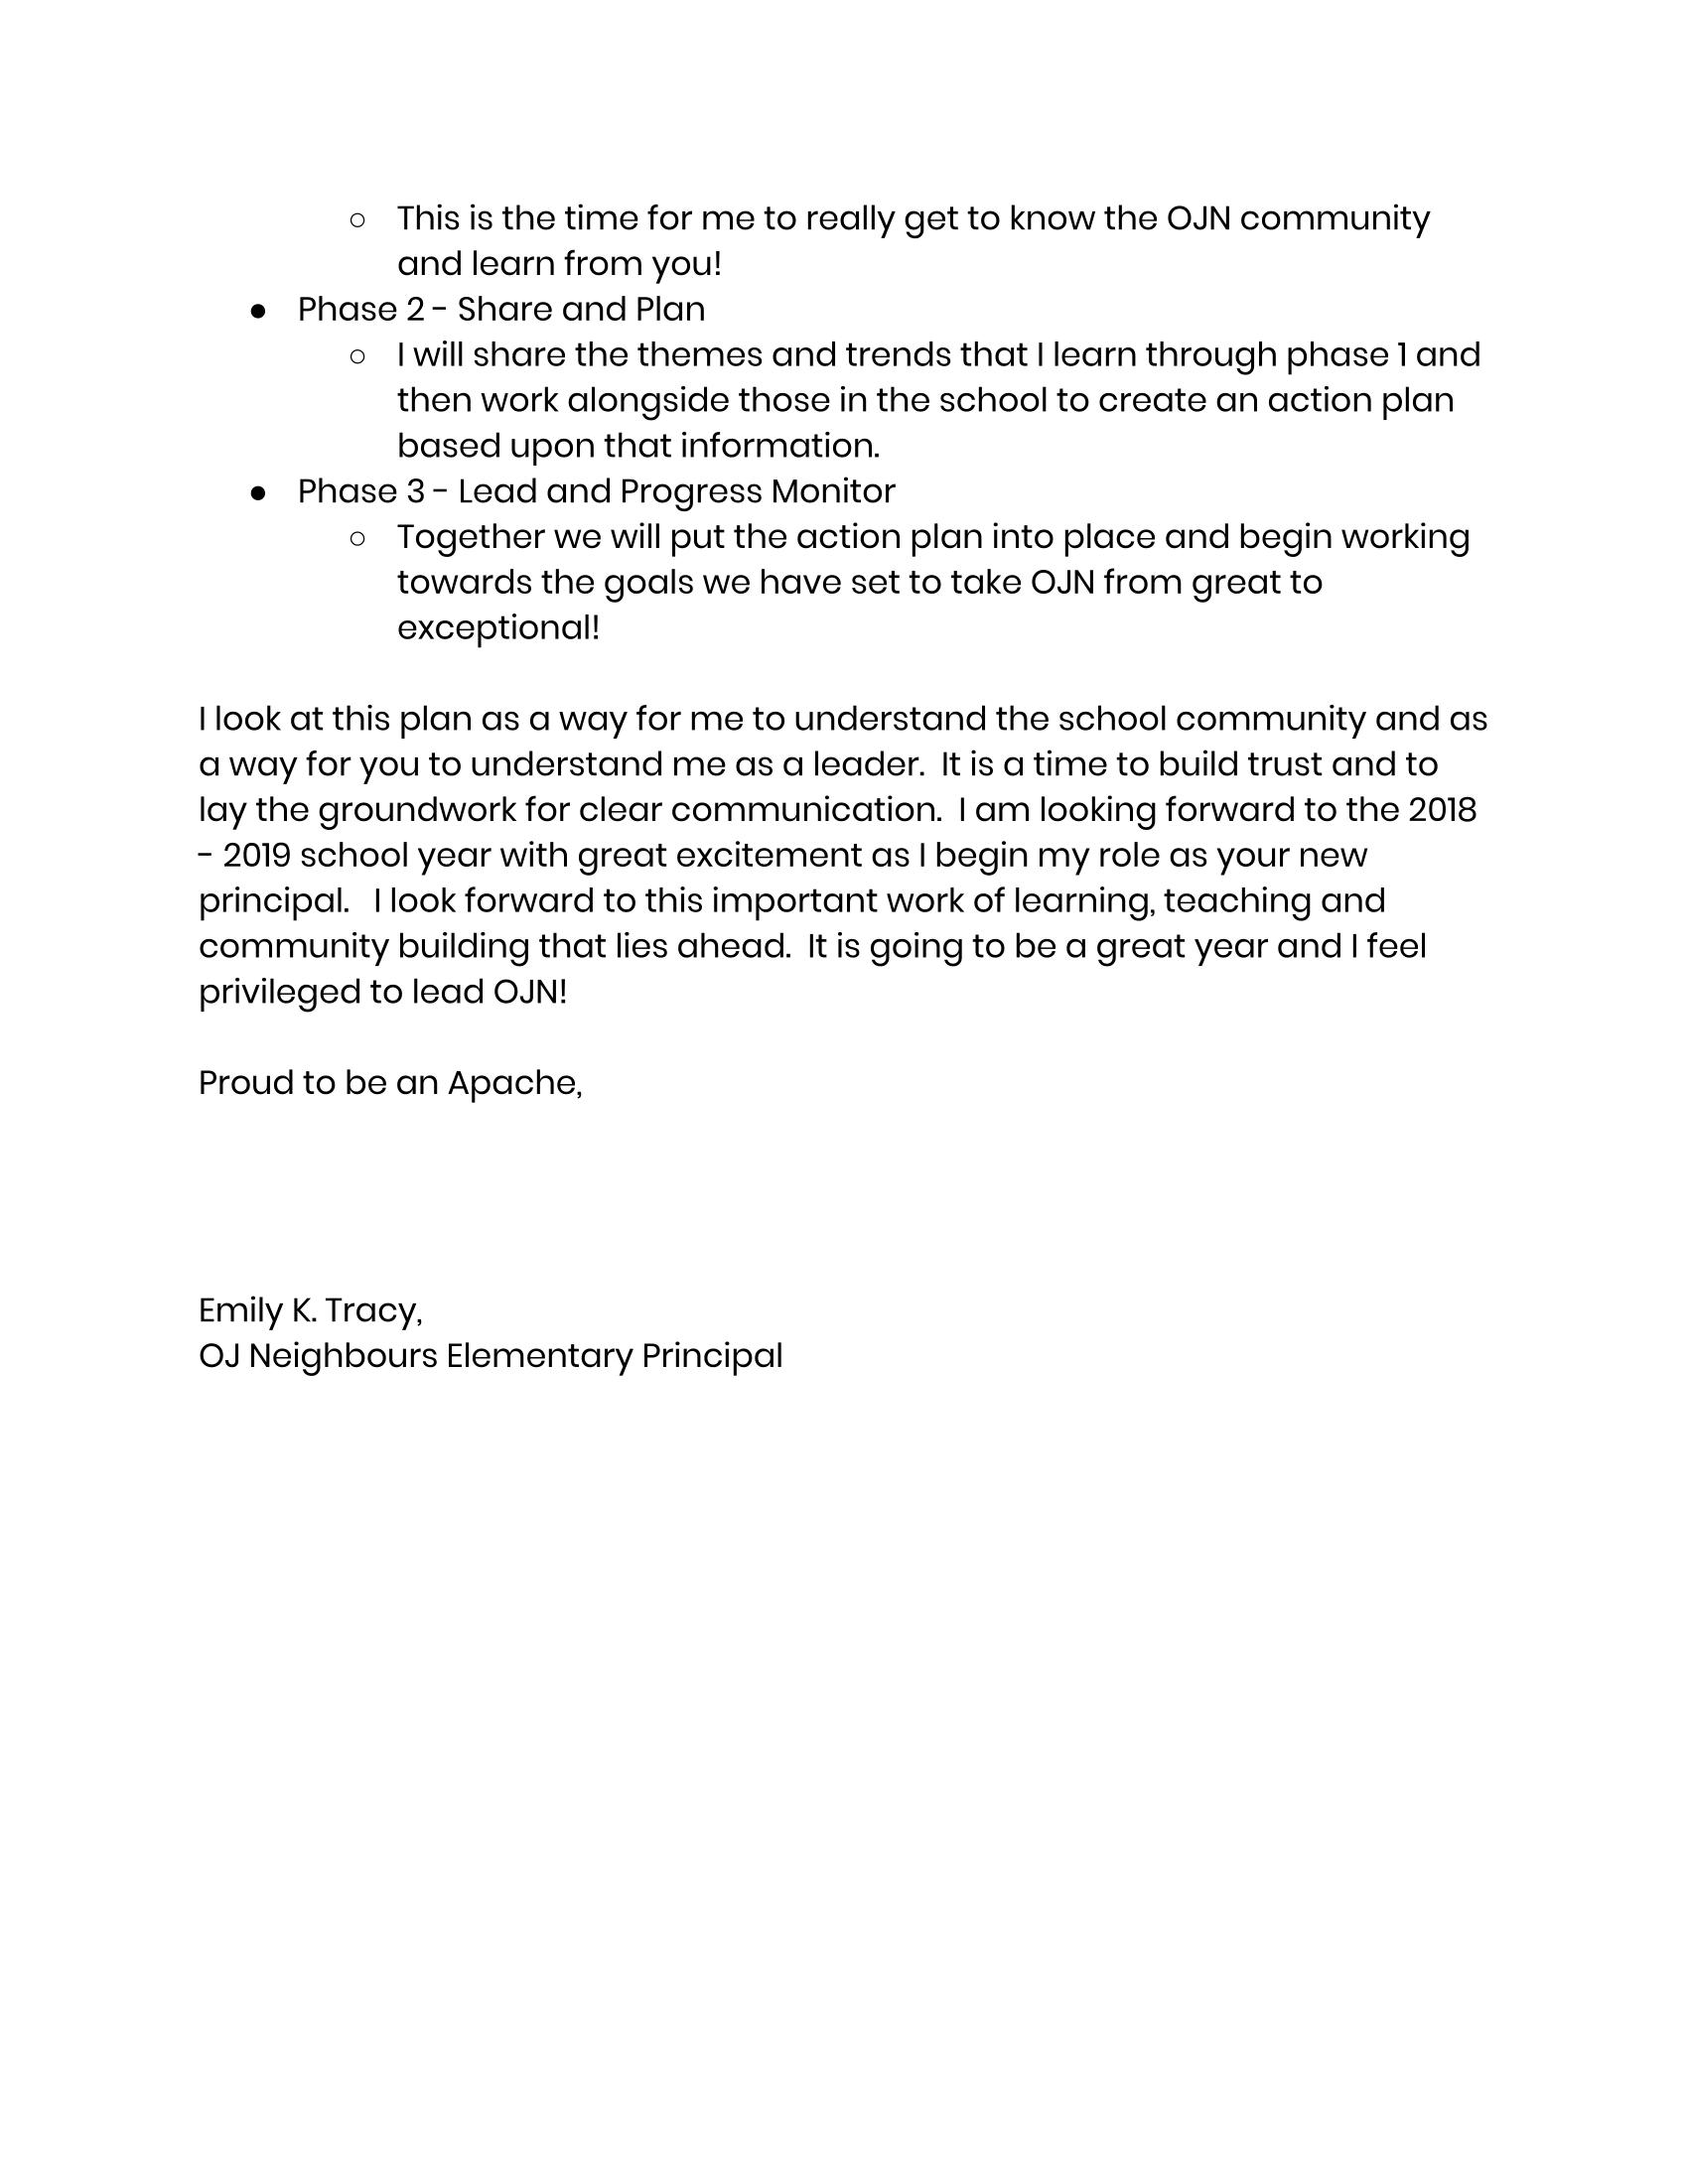 Principal's Message page 2